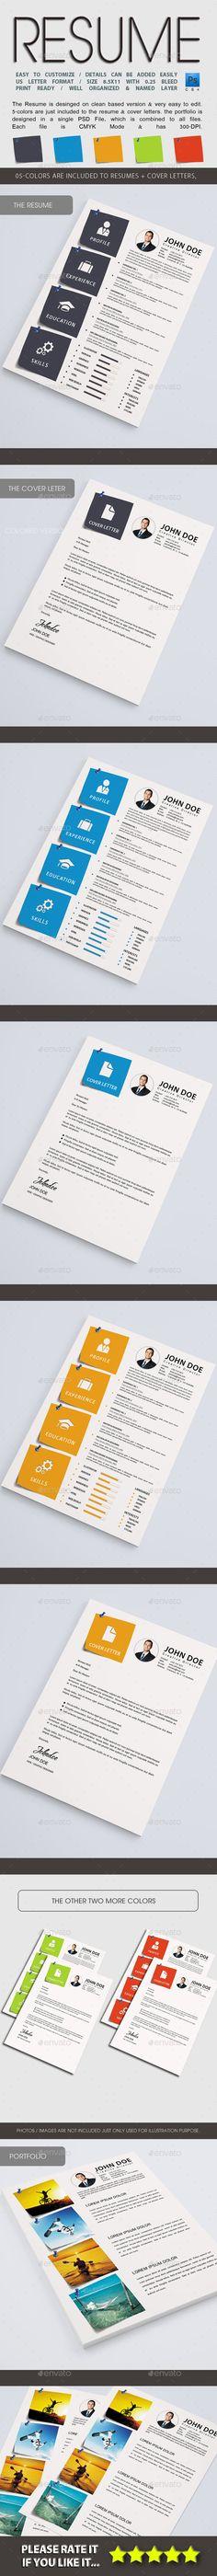 Resume - Resume Template Cv ideas, Simple resume template and - photoshop resume template